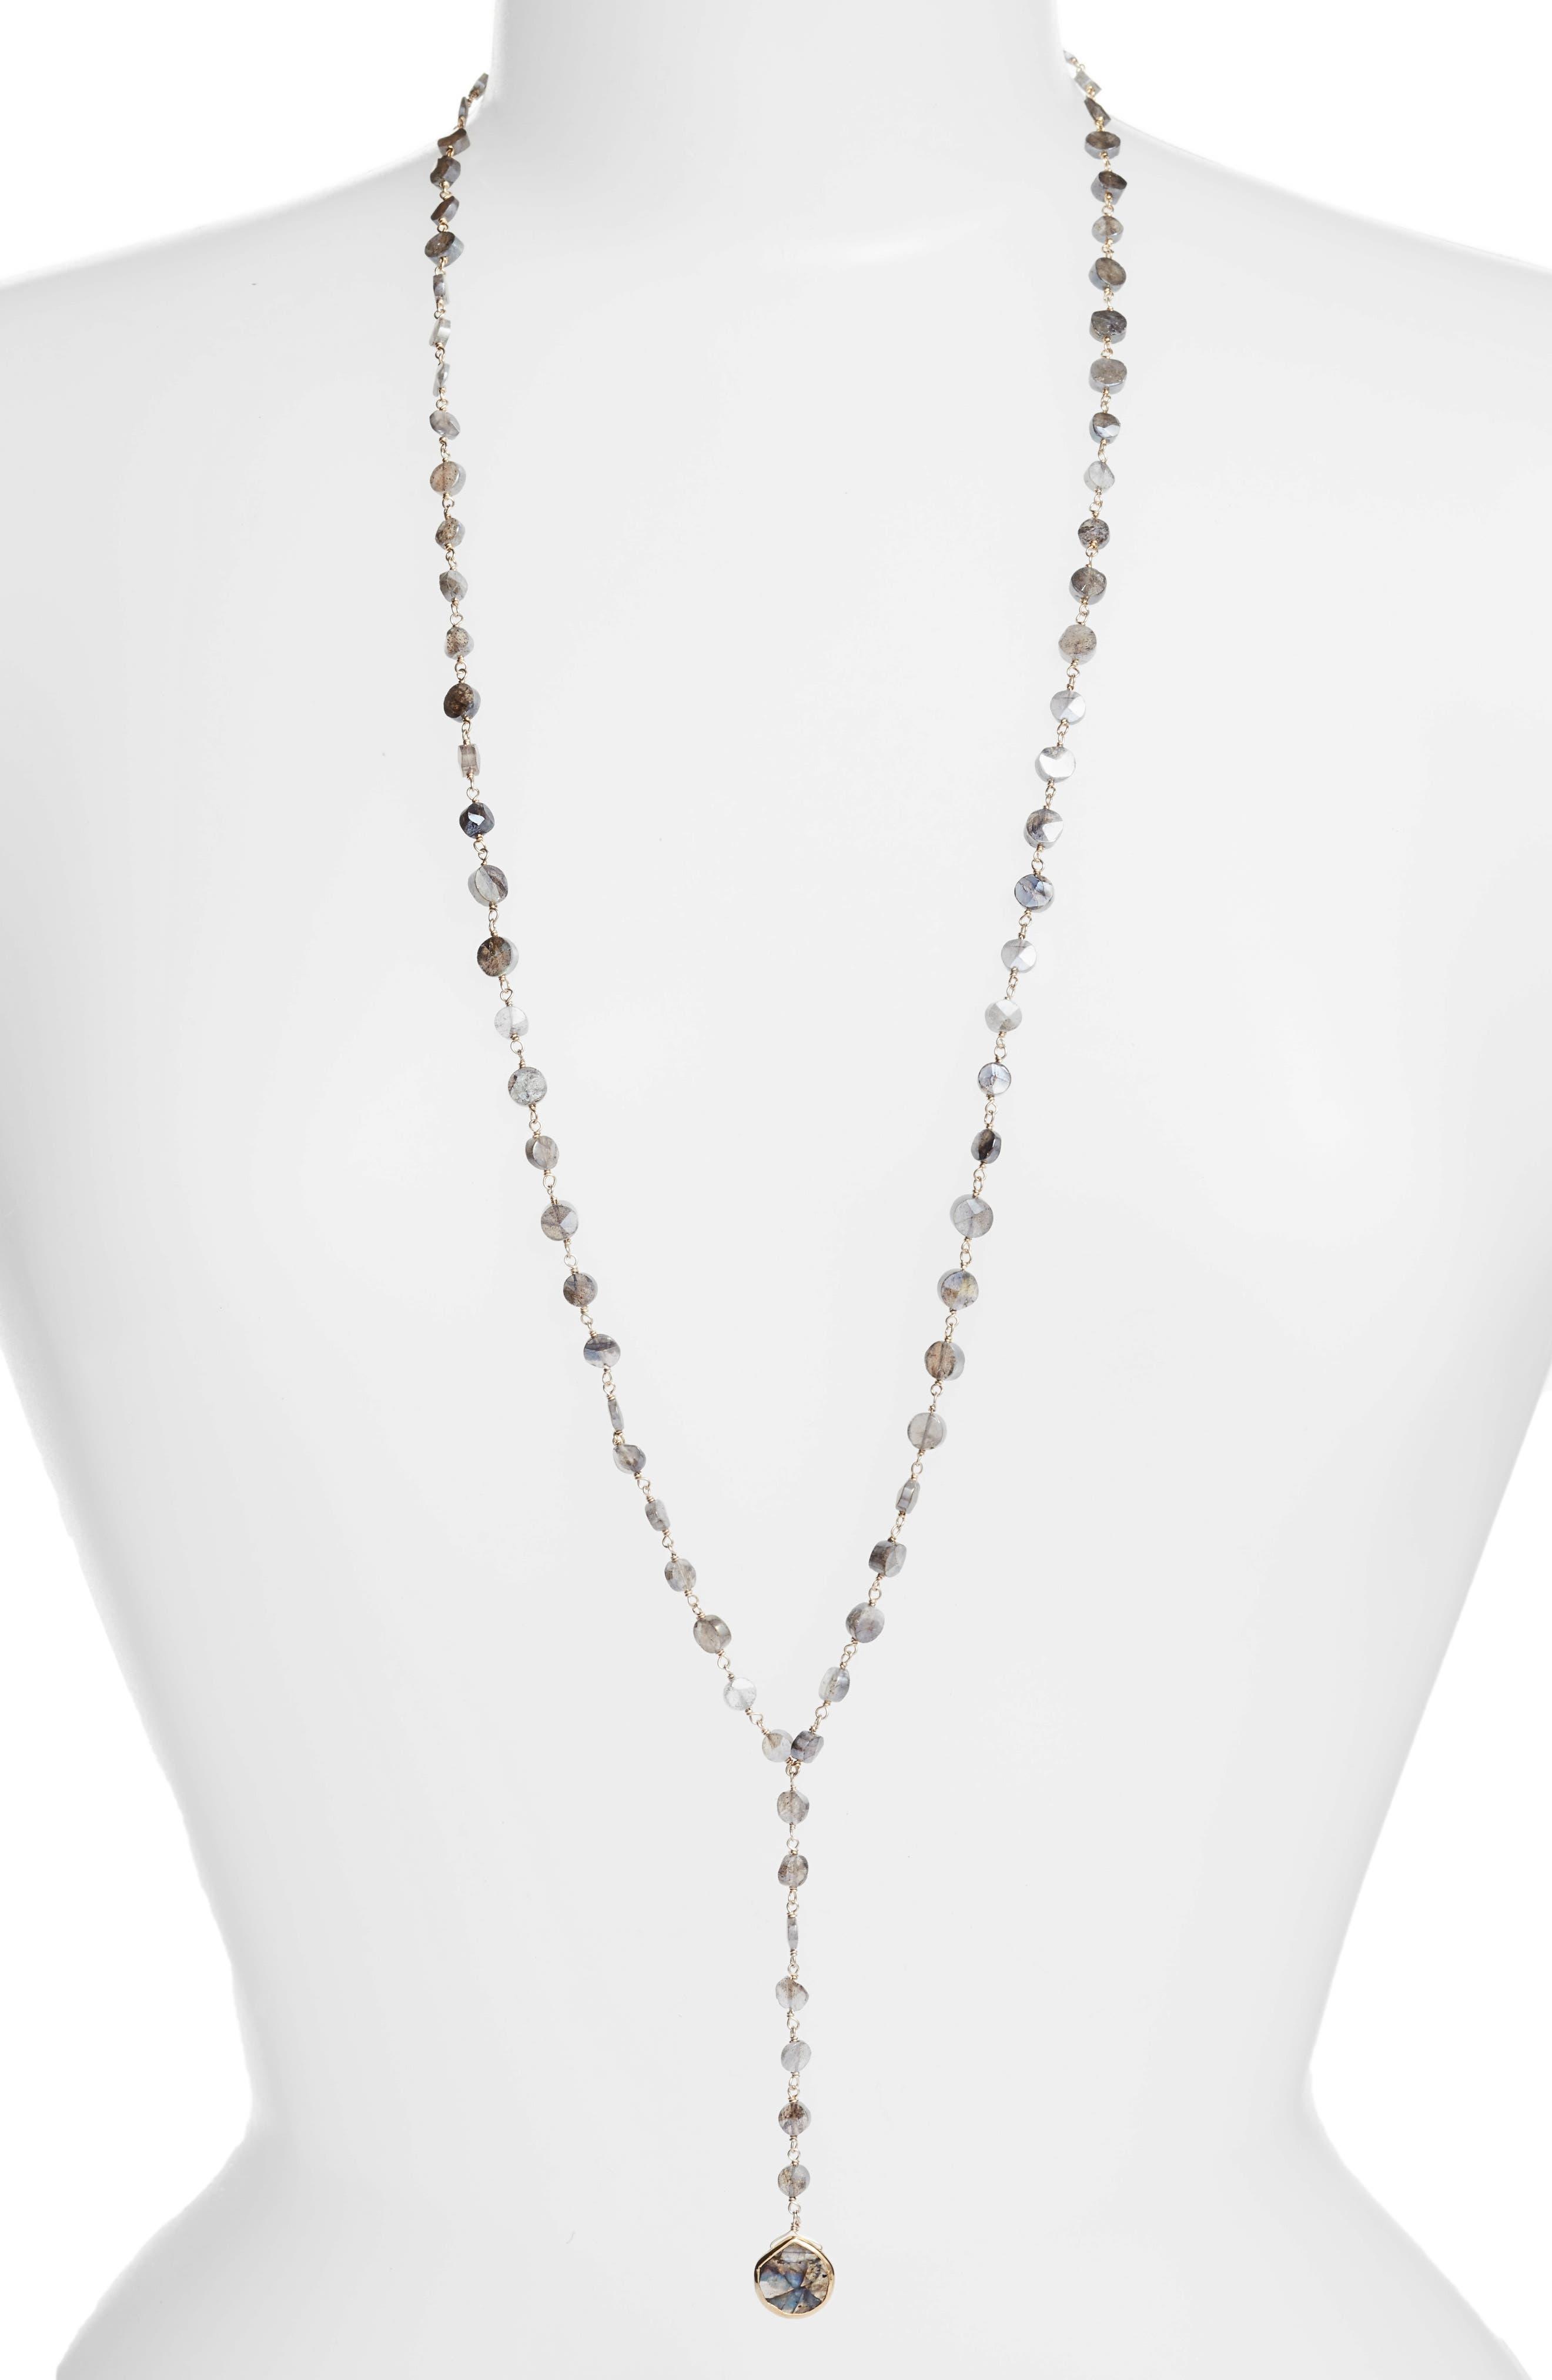 Yaeli Coin Semiprecious Stone Y-Necklace,                             Main thumbnail 1, color,                             Mystic Labradorite